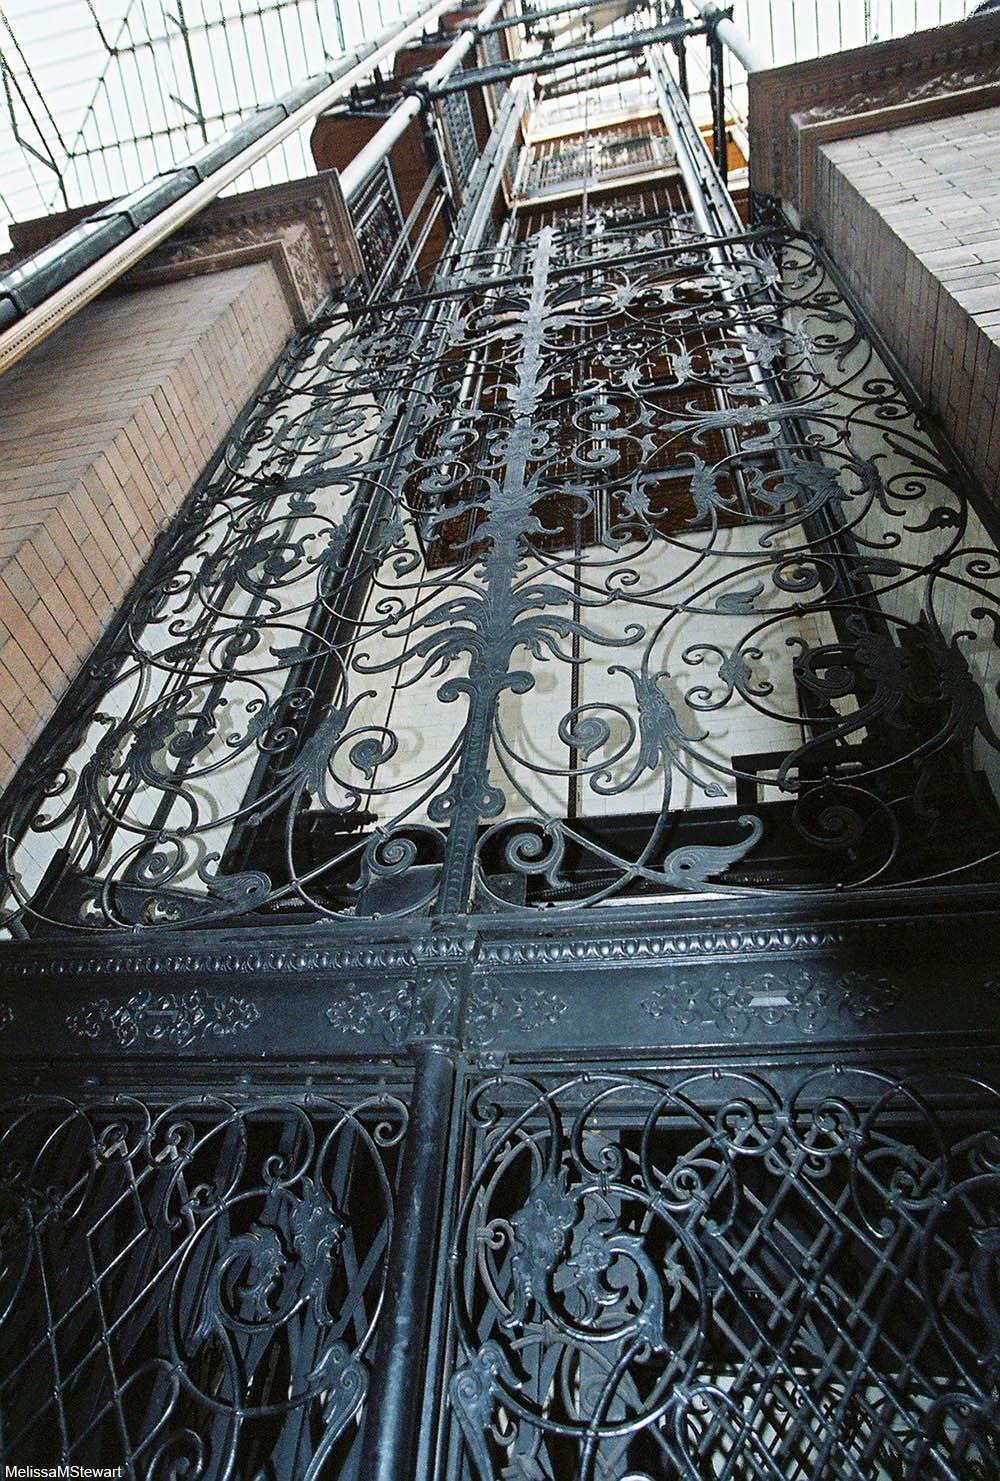 Bradbury Building elevator shaft decoration